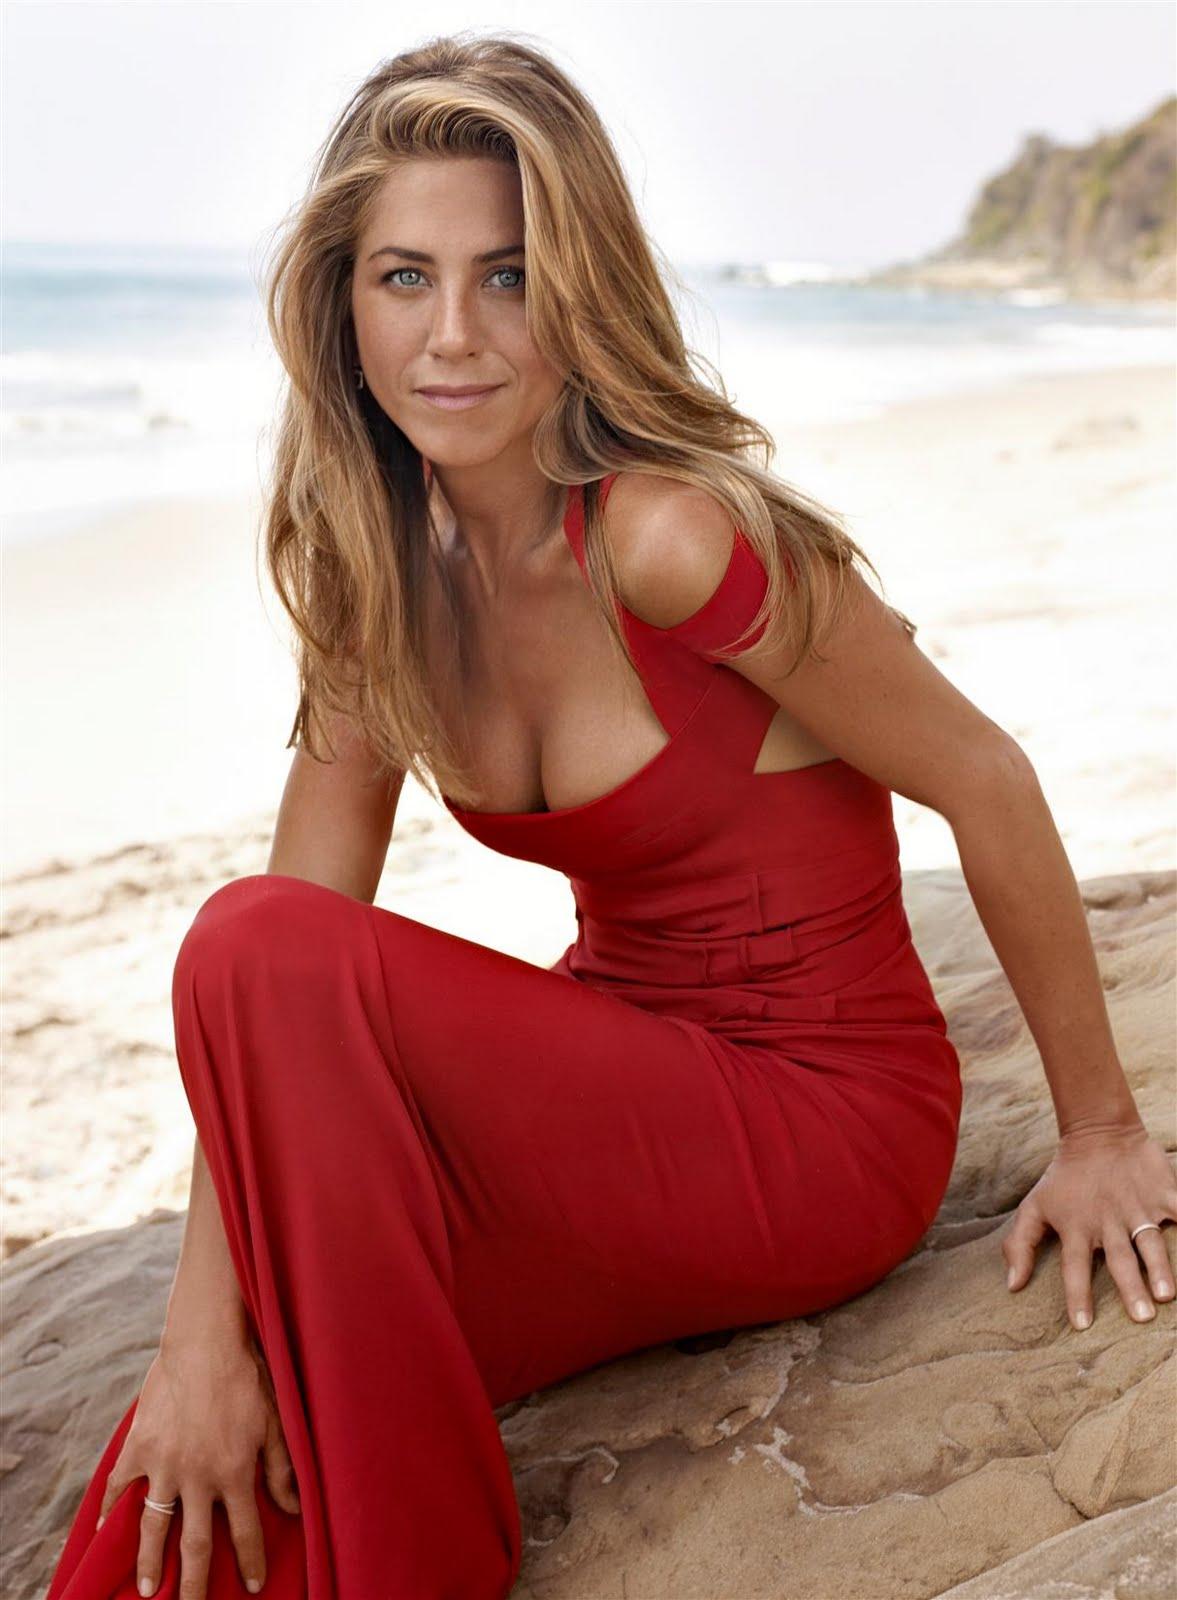 jennifer aniston celebrity actress - photo #14